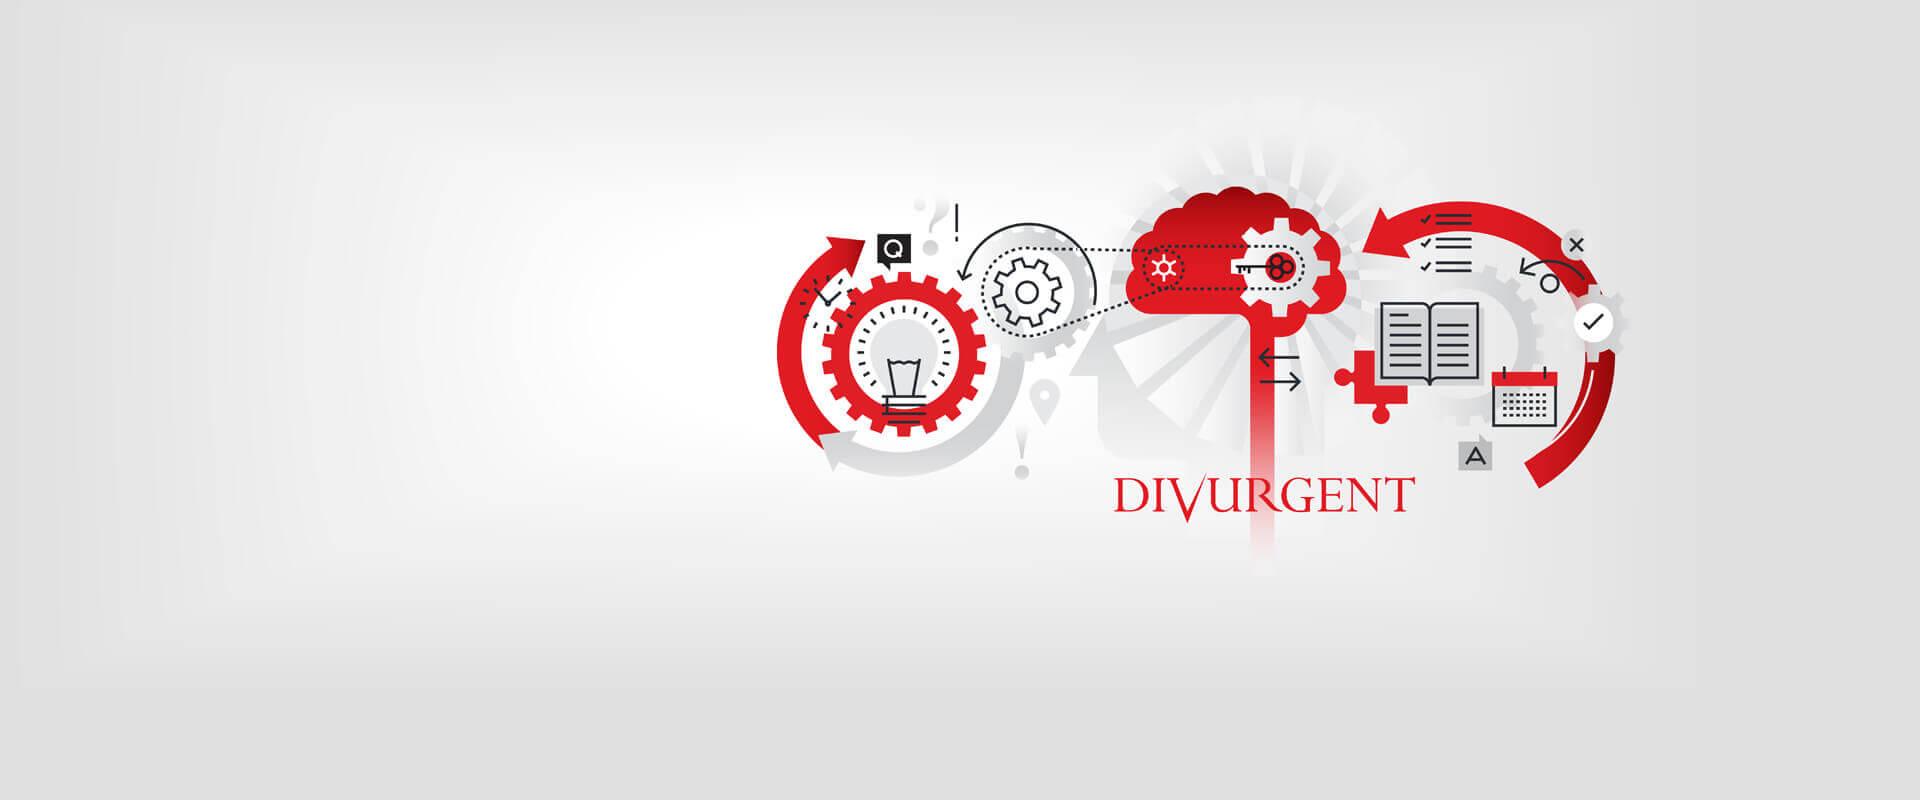 services_banner_divurgent